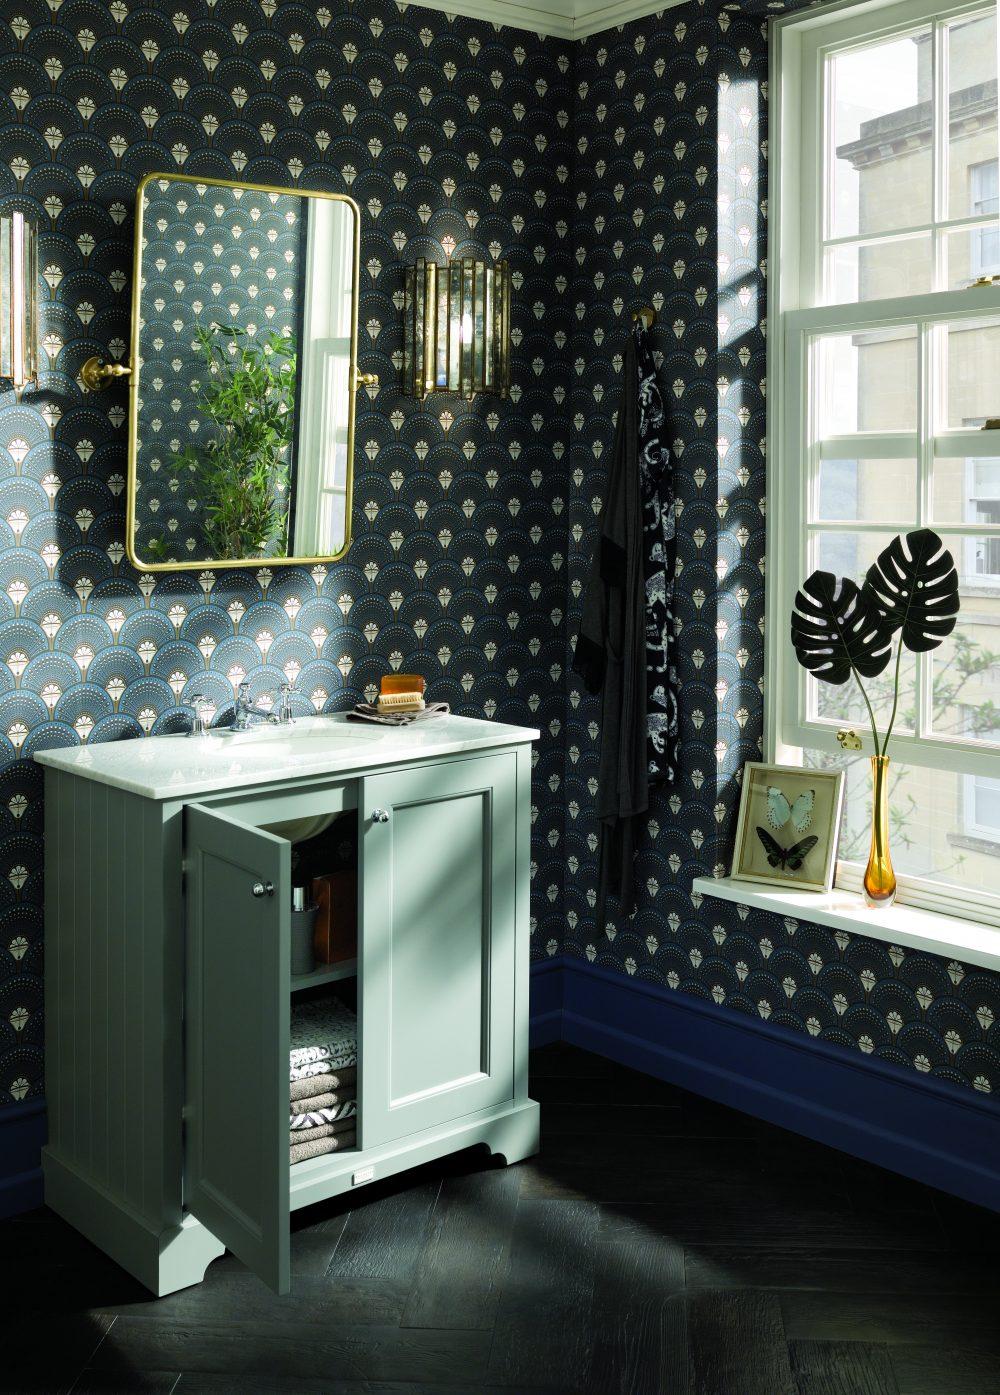 The Open Plummett Grey 800 Furniture Unit with Divine Savages Wallpaper - Deco Martini